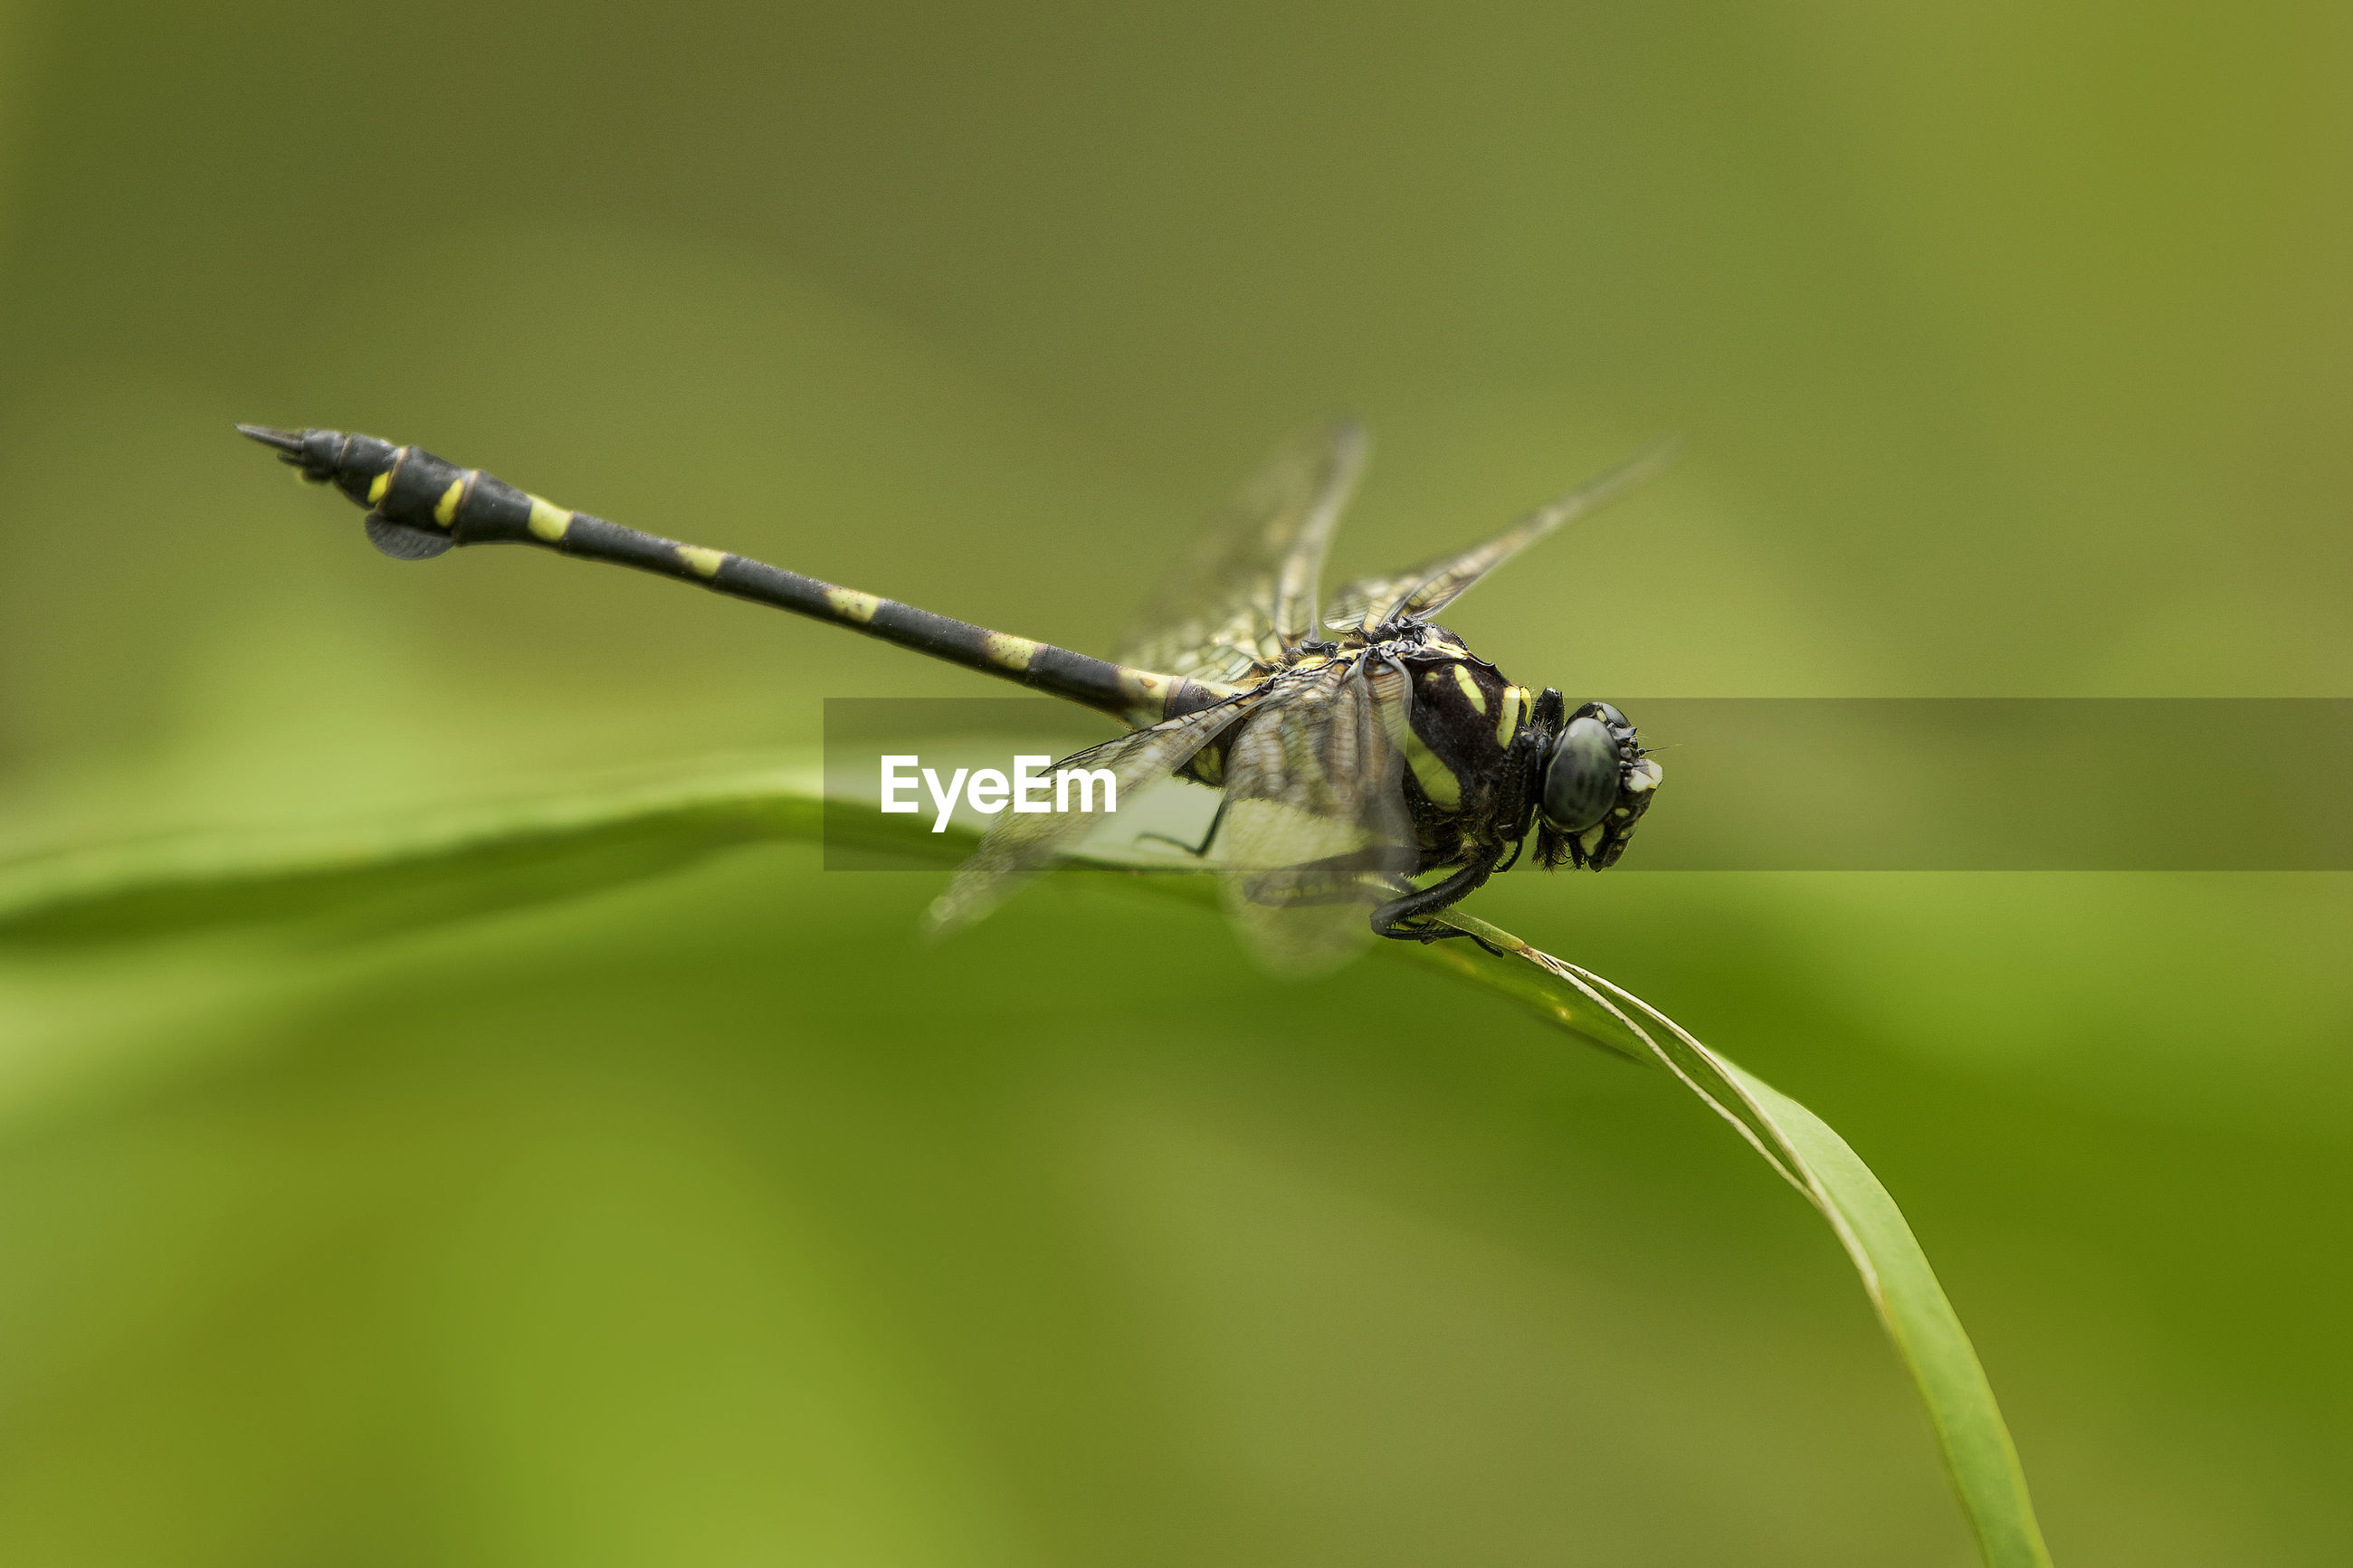 Close-up of damselfly on leaf